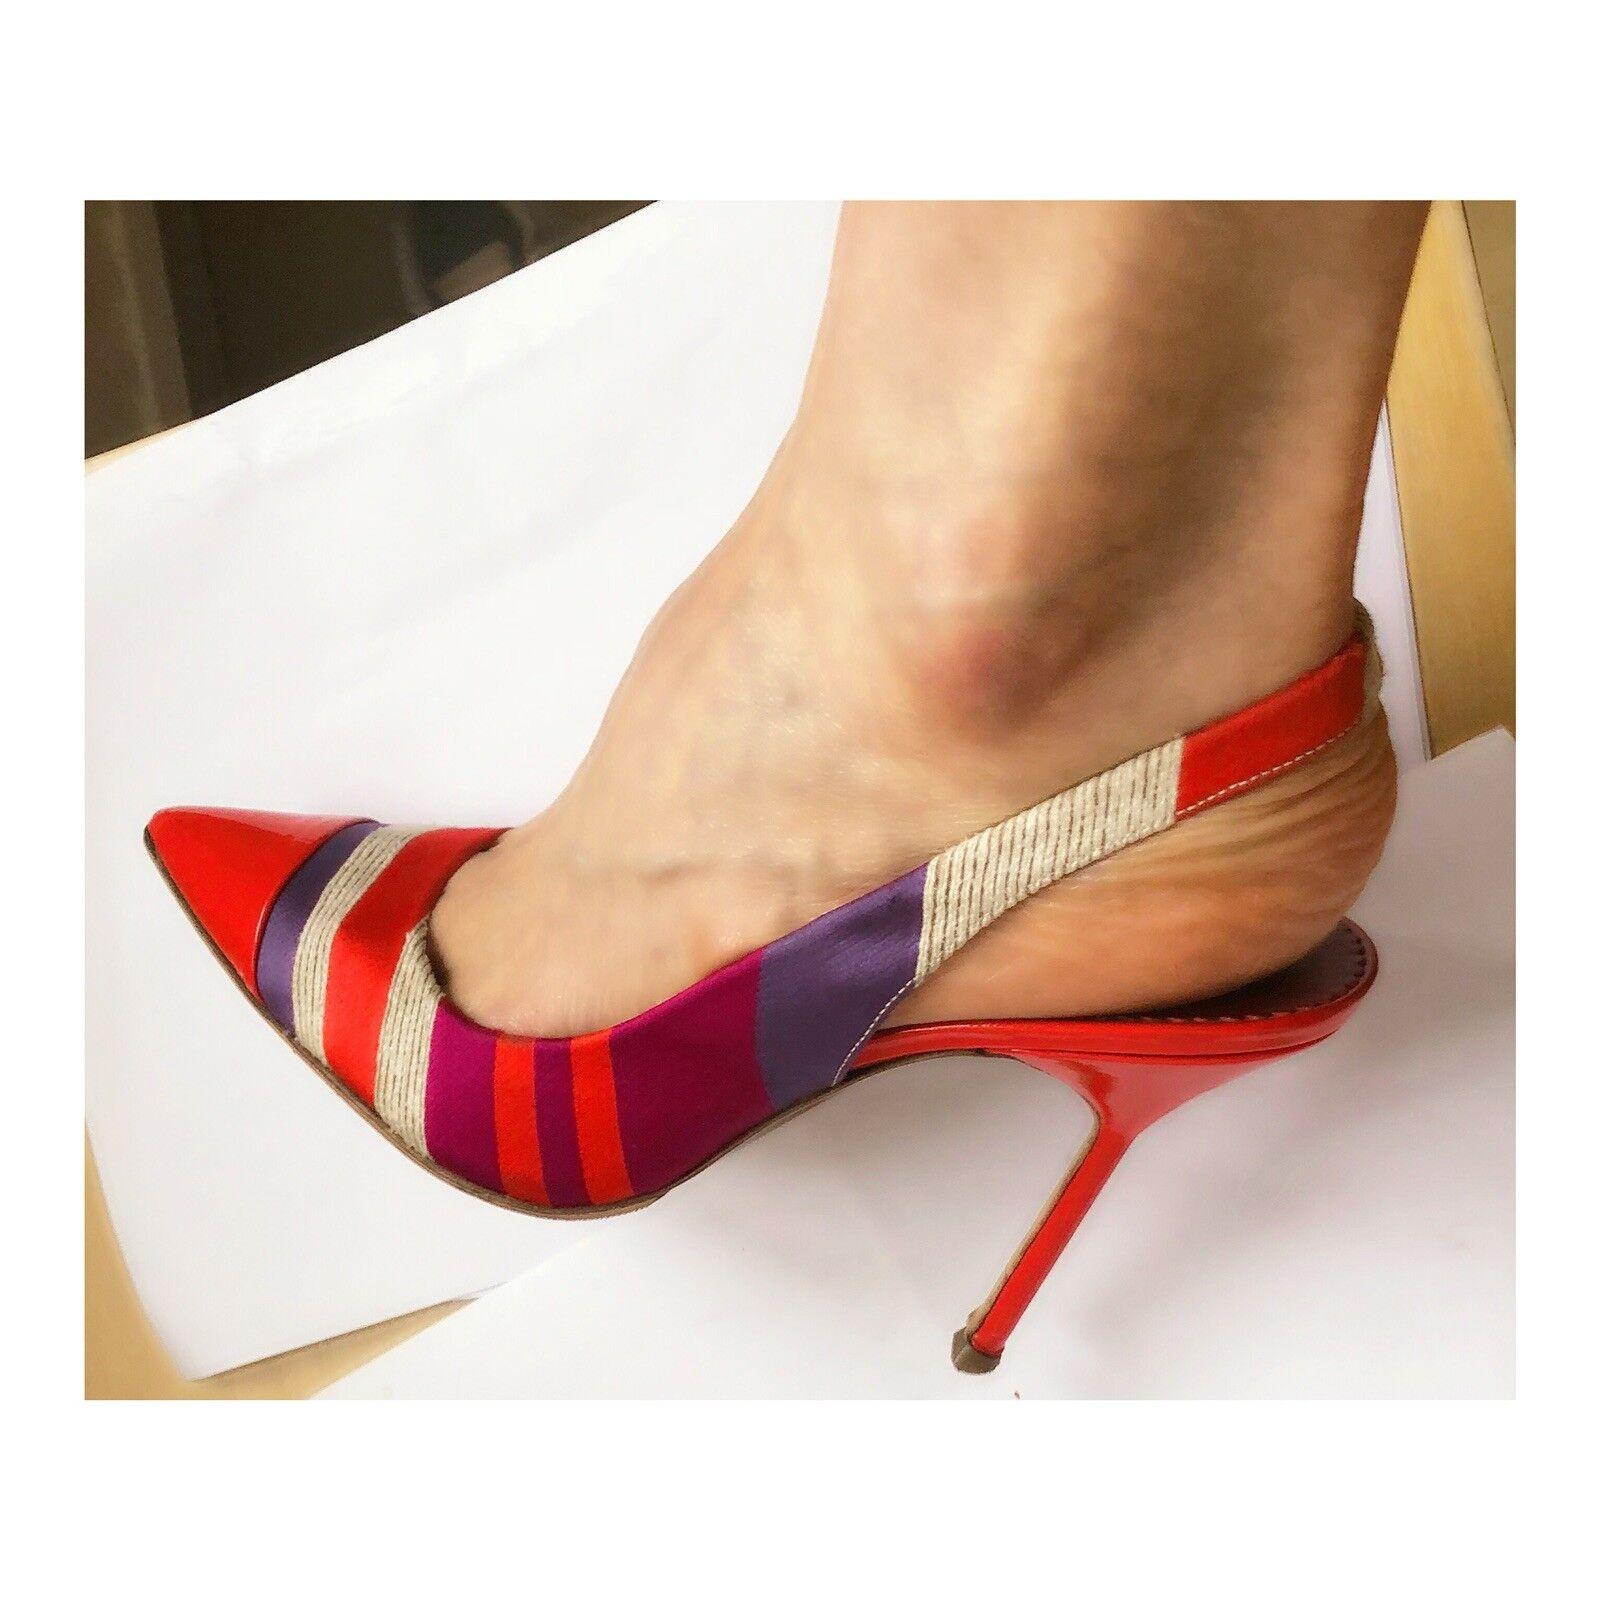 Carolina Herrera Bride Arrière Chaussures Eu 39, UK 6. peu utilisé.